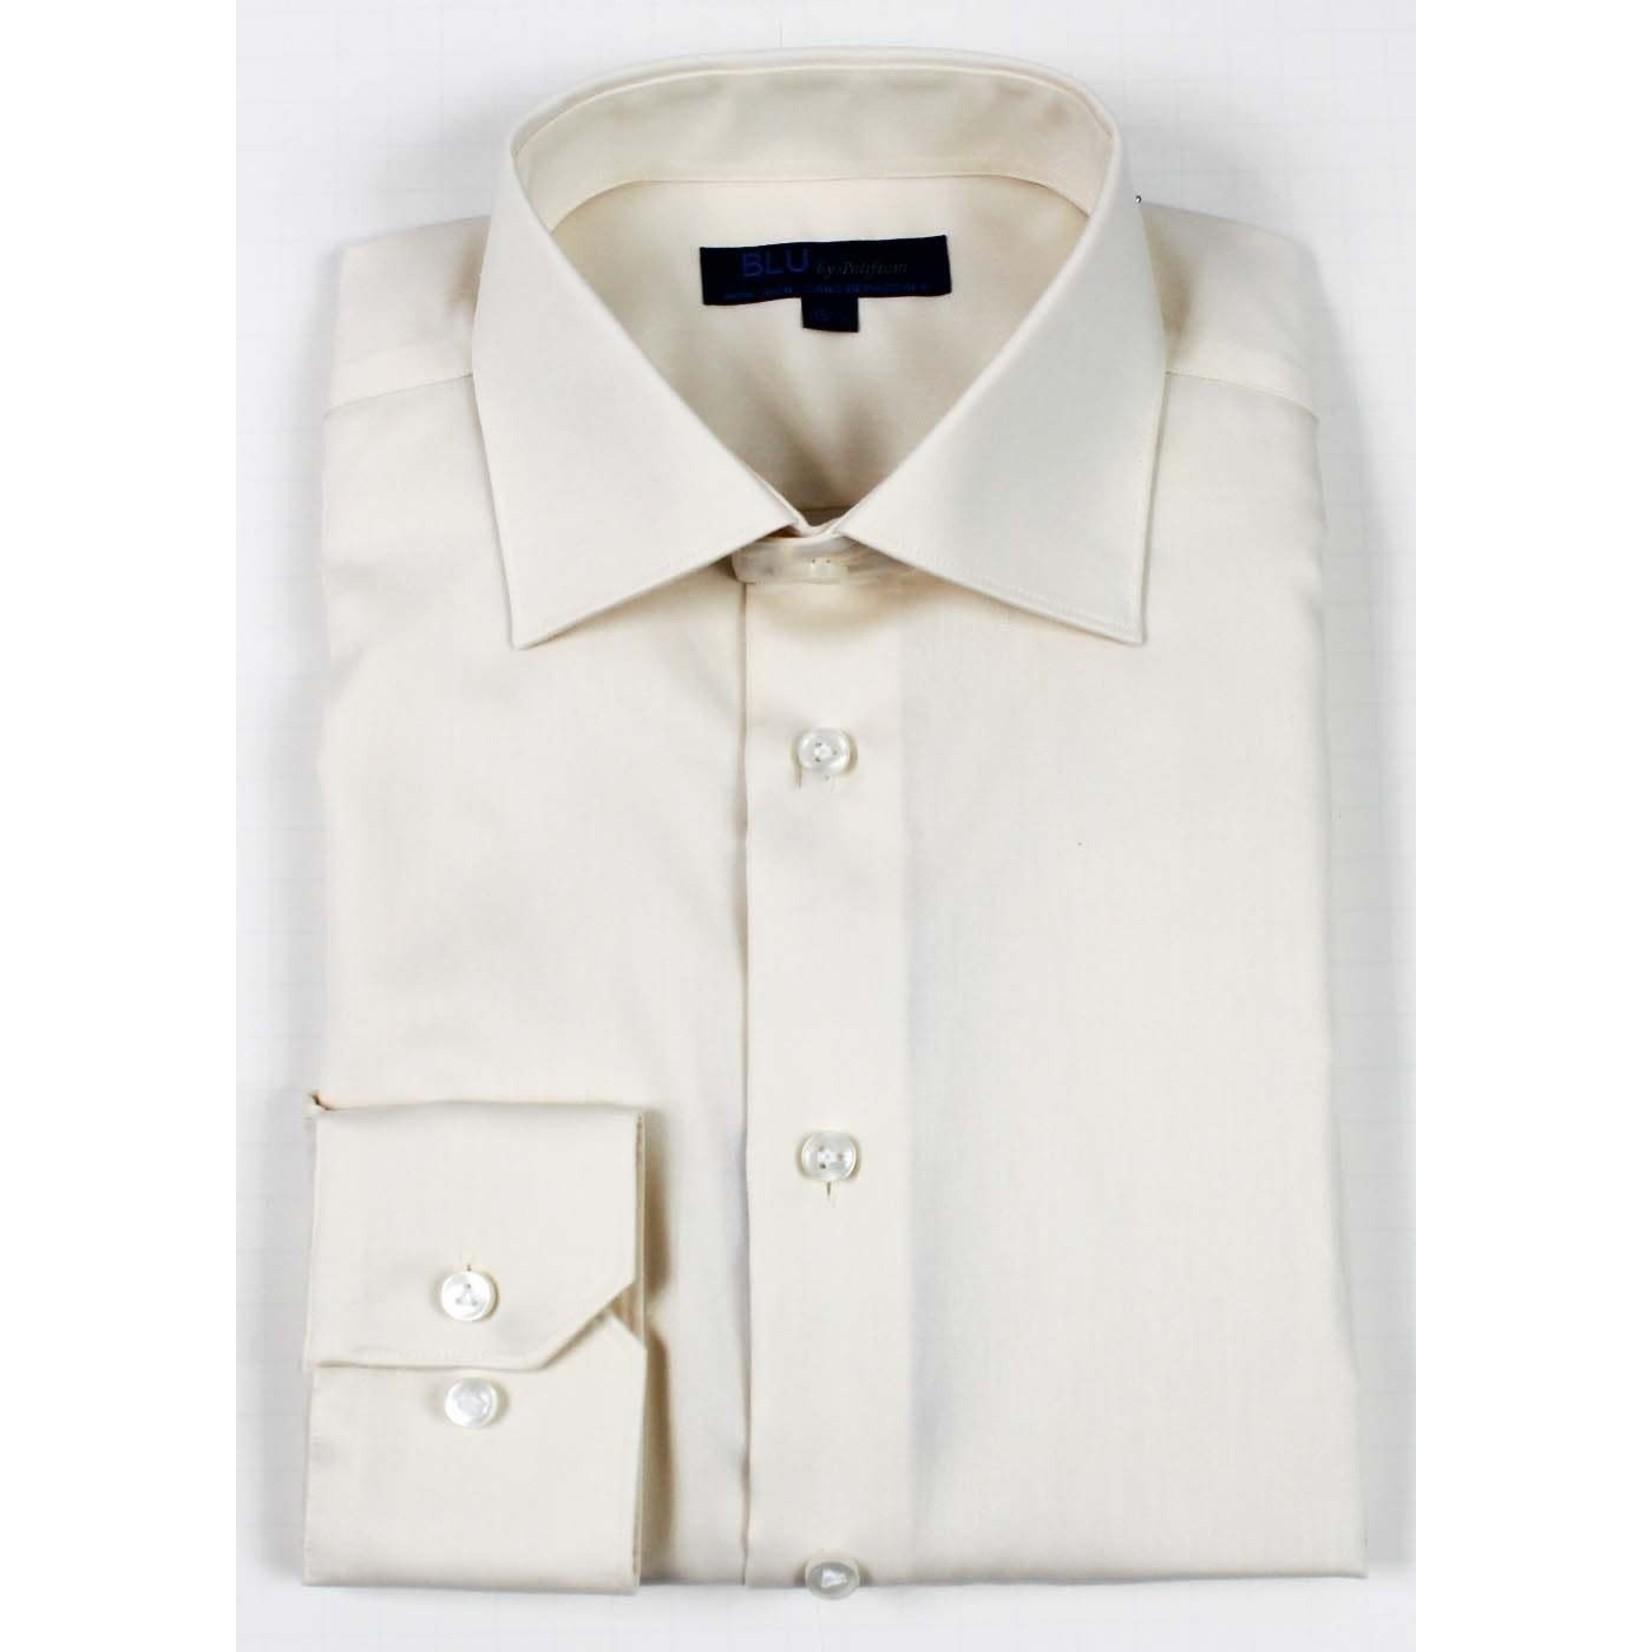 Polifroni Blu-360M Miami Non-Iron Dress Shirt 05 Ecru